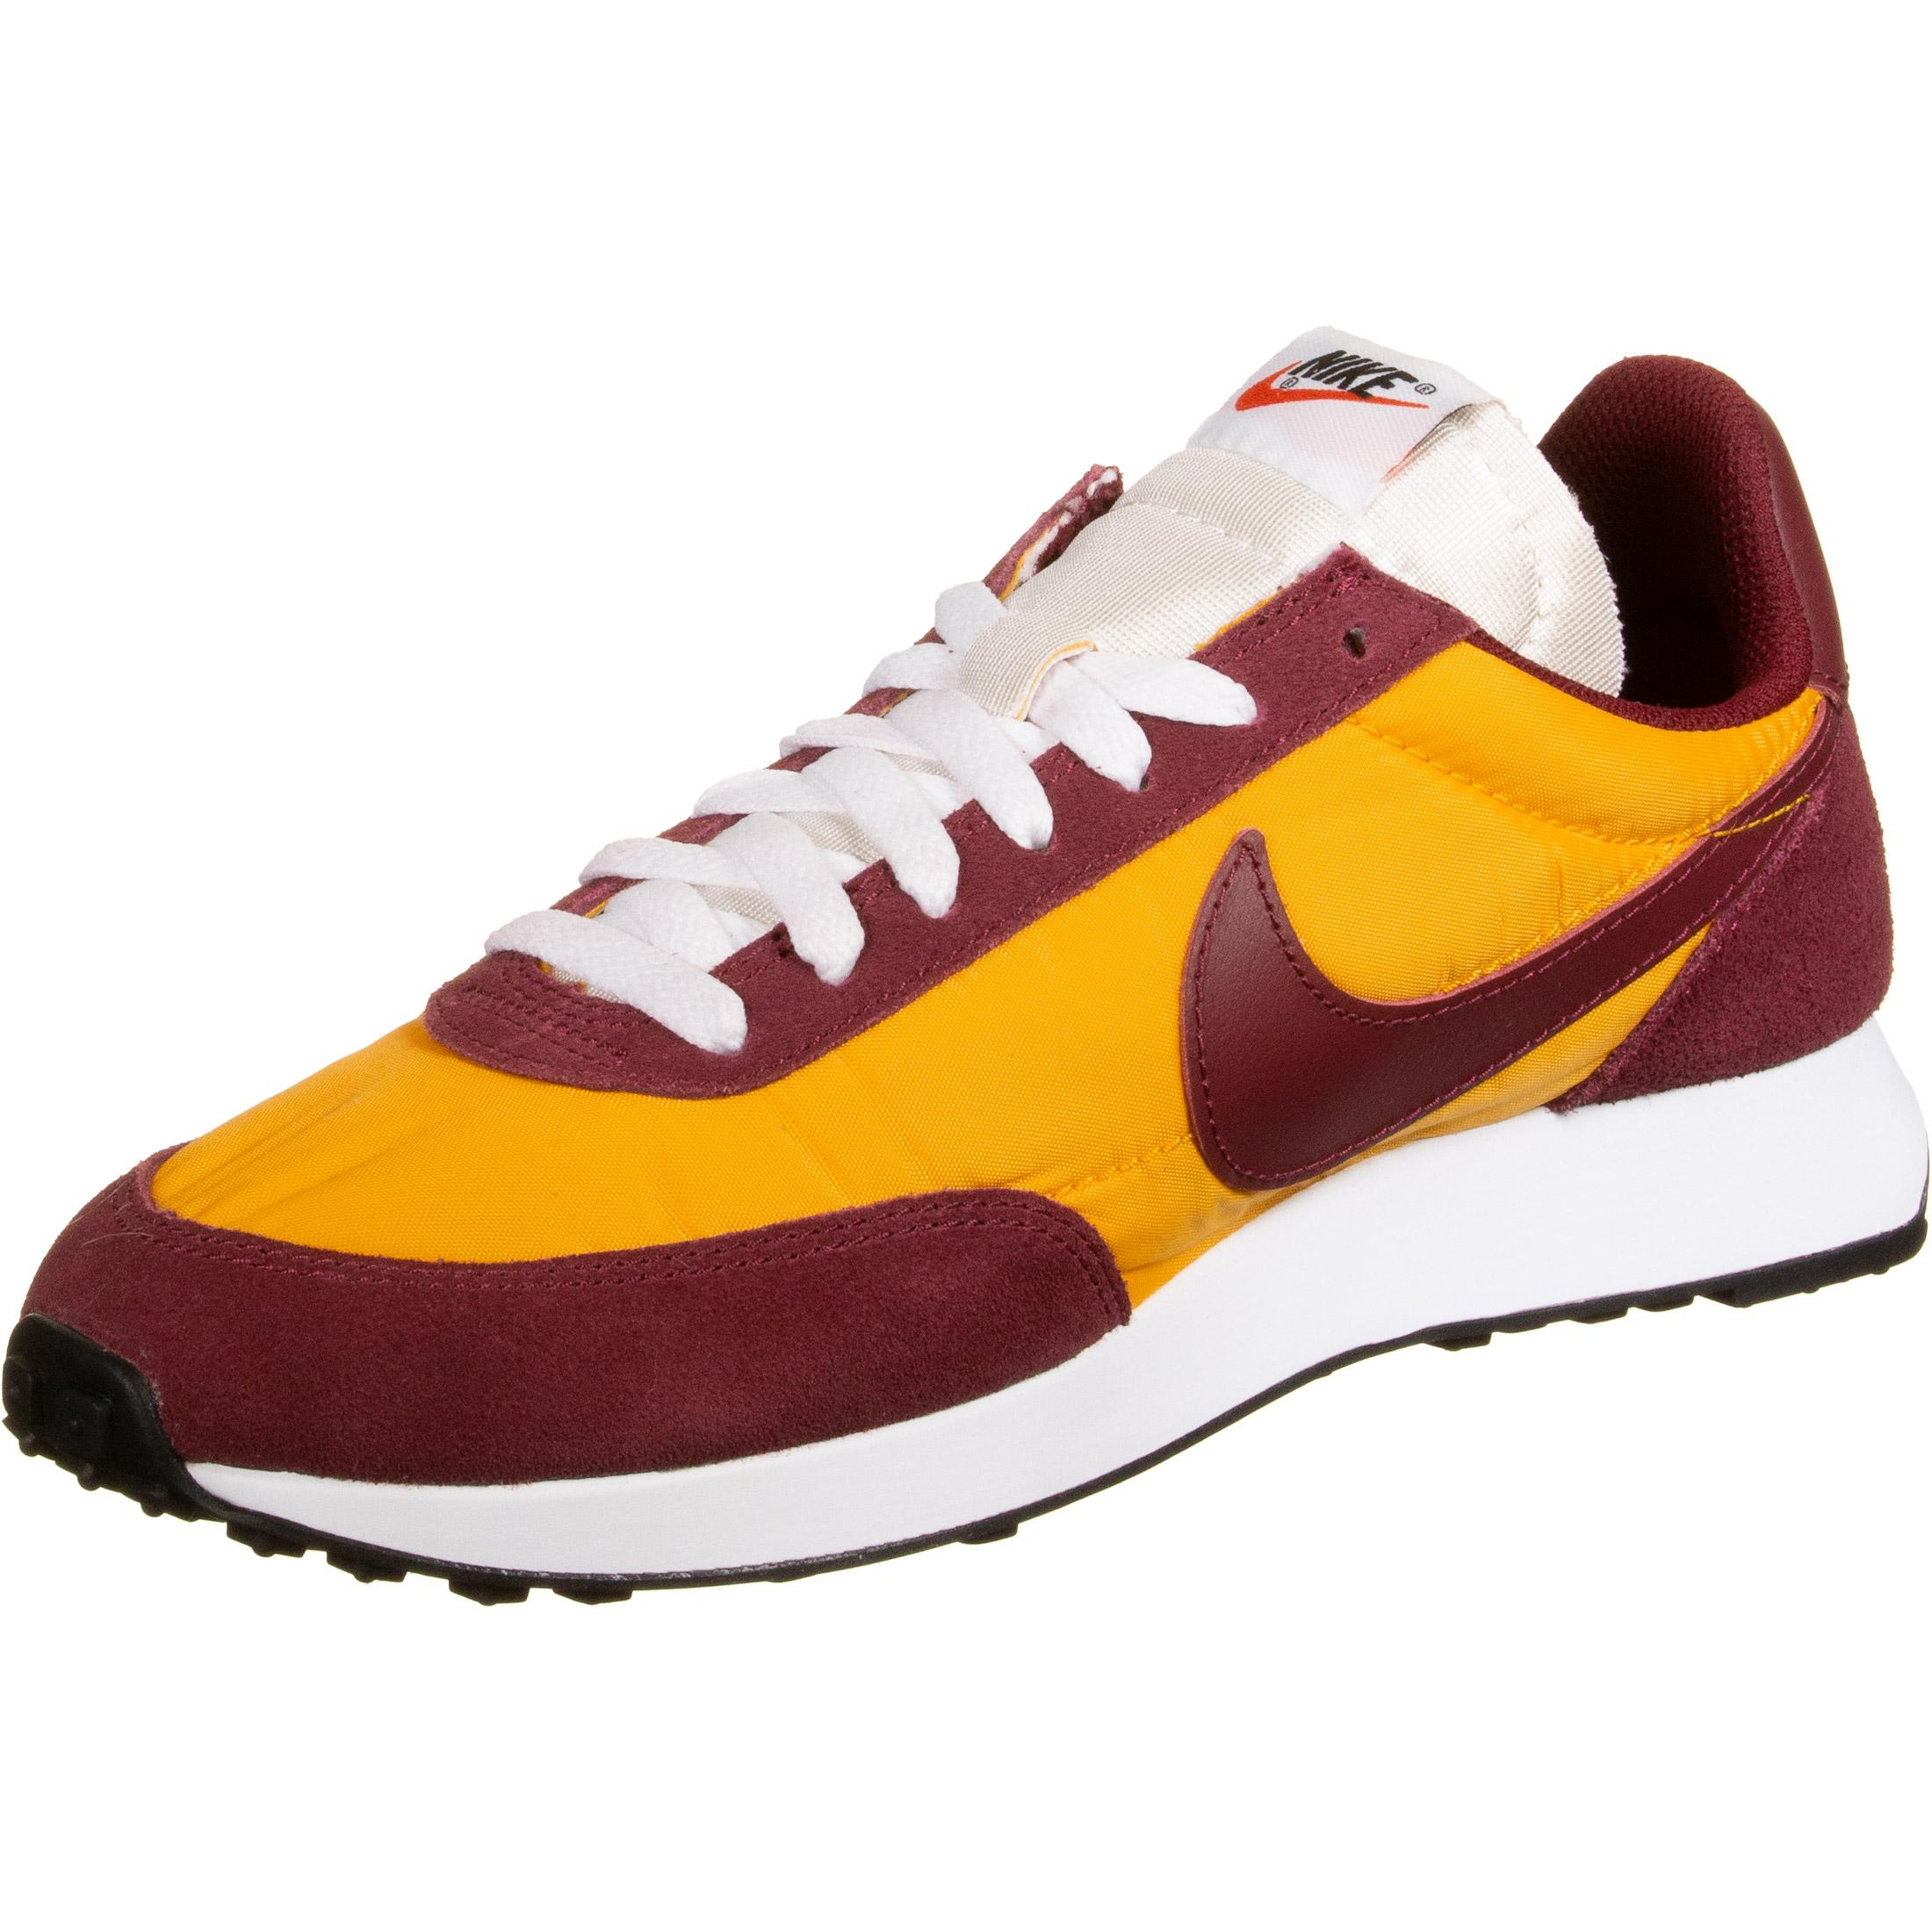 Nike Air Tailwind 79 - Sneakers Low at